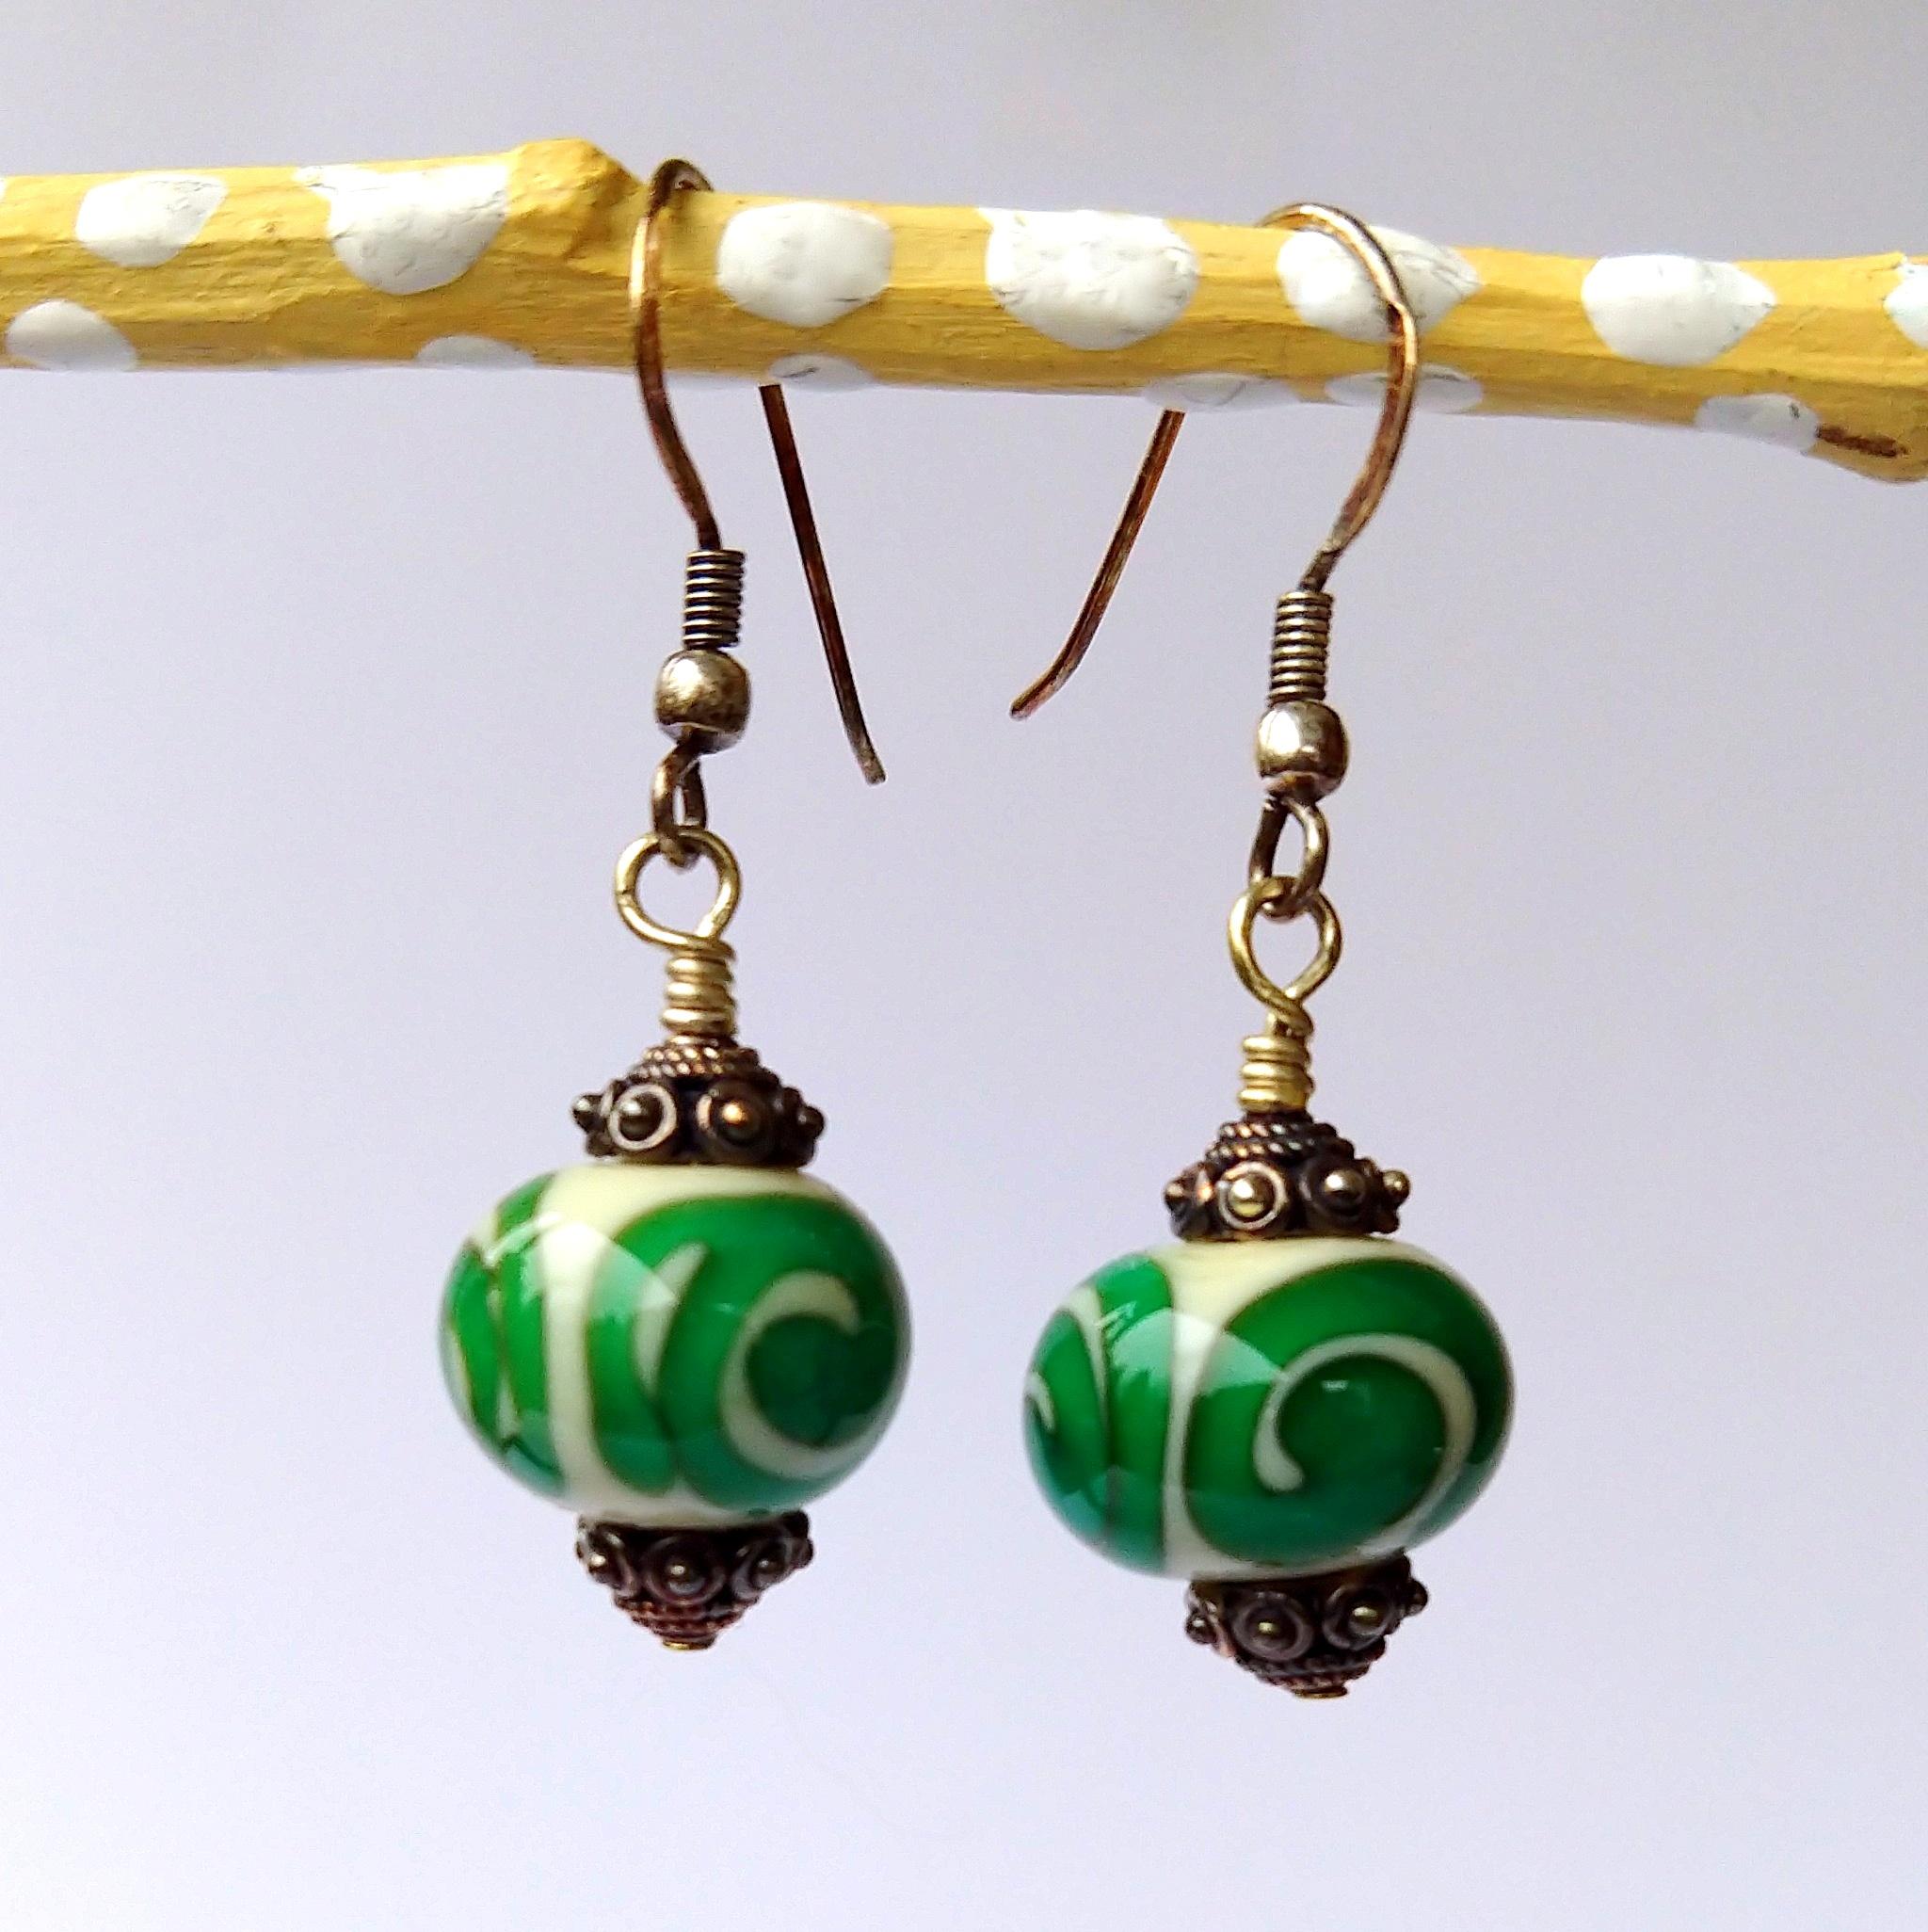 Handmade Glass Bead Earrings, Bitty Bits Mosaics-012.jpg